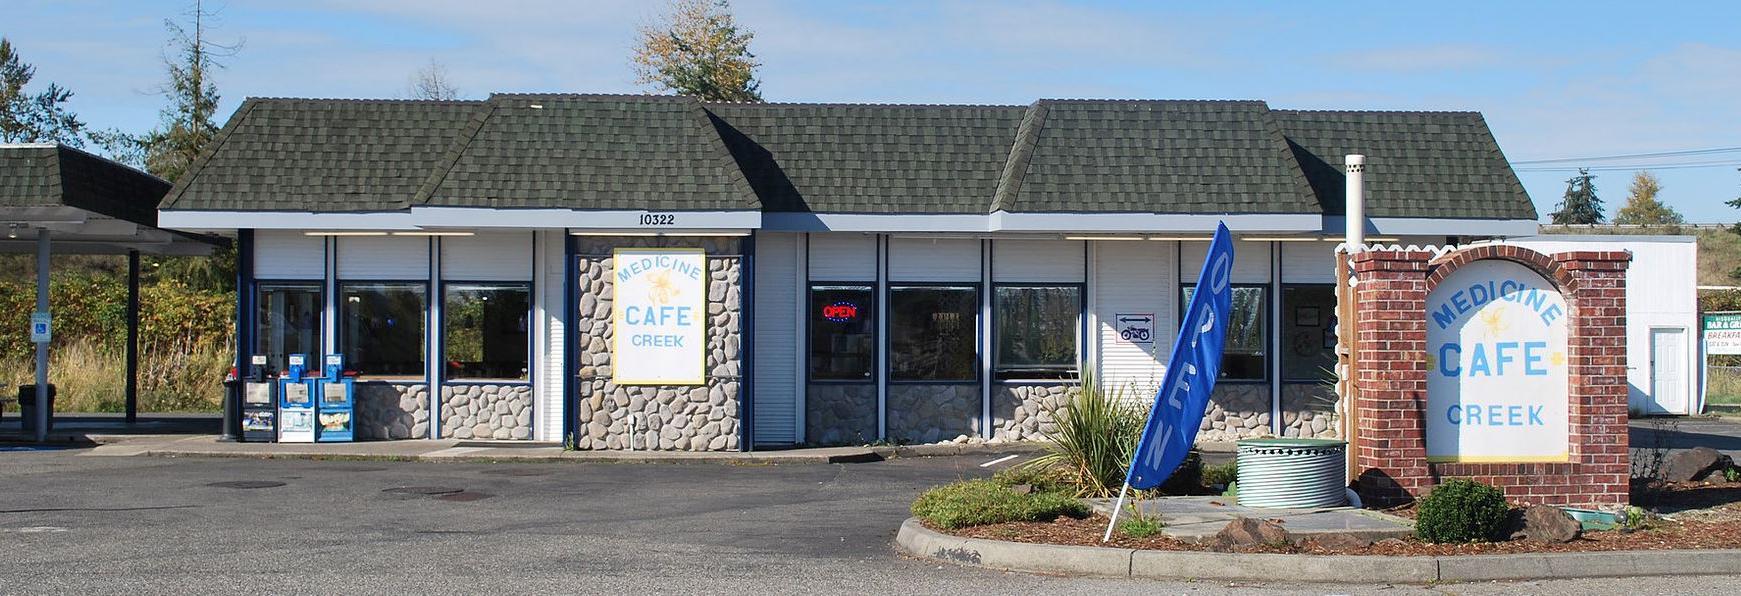 Medicine Creek Cafe banner image - Olympia, WA